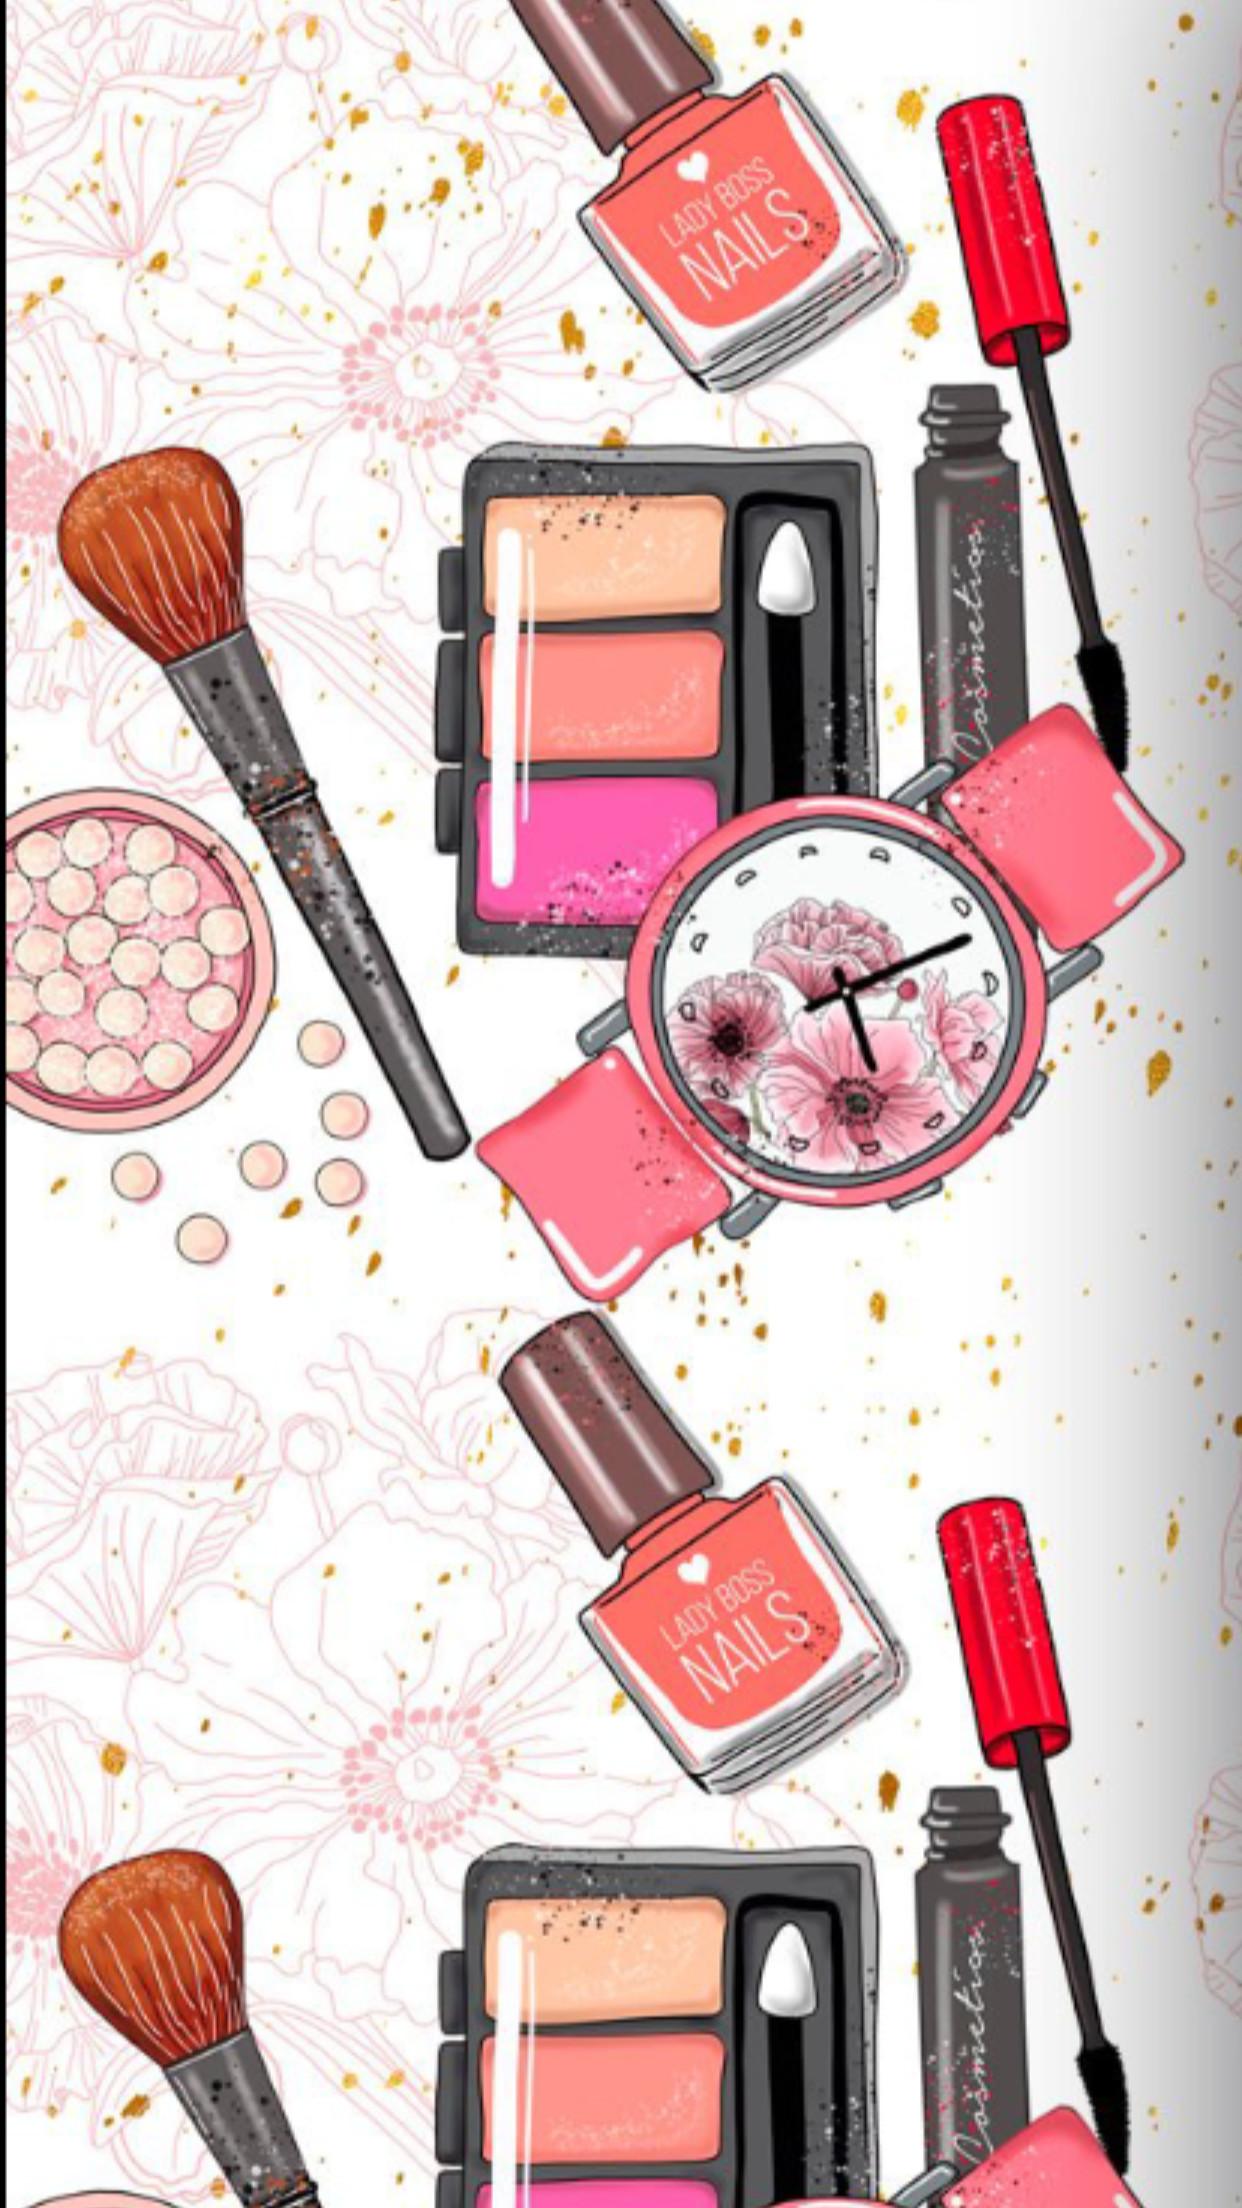 Makeup Wallpapers For Desktop 67 Images